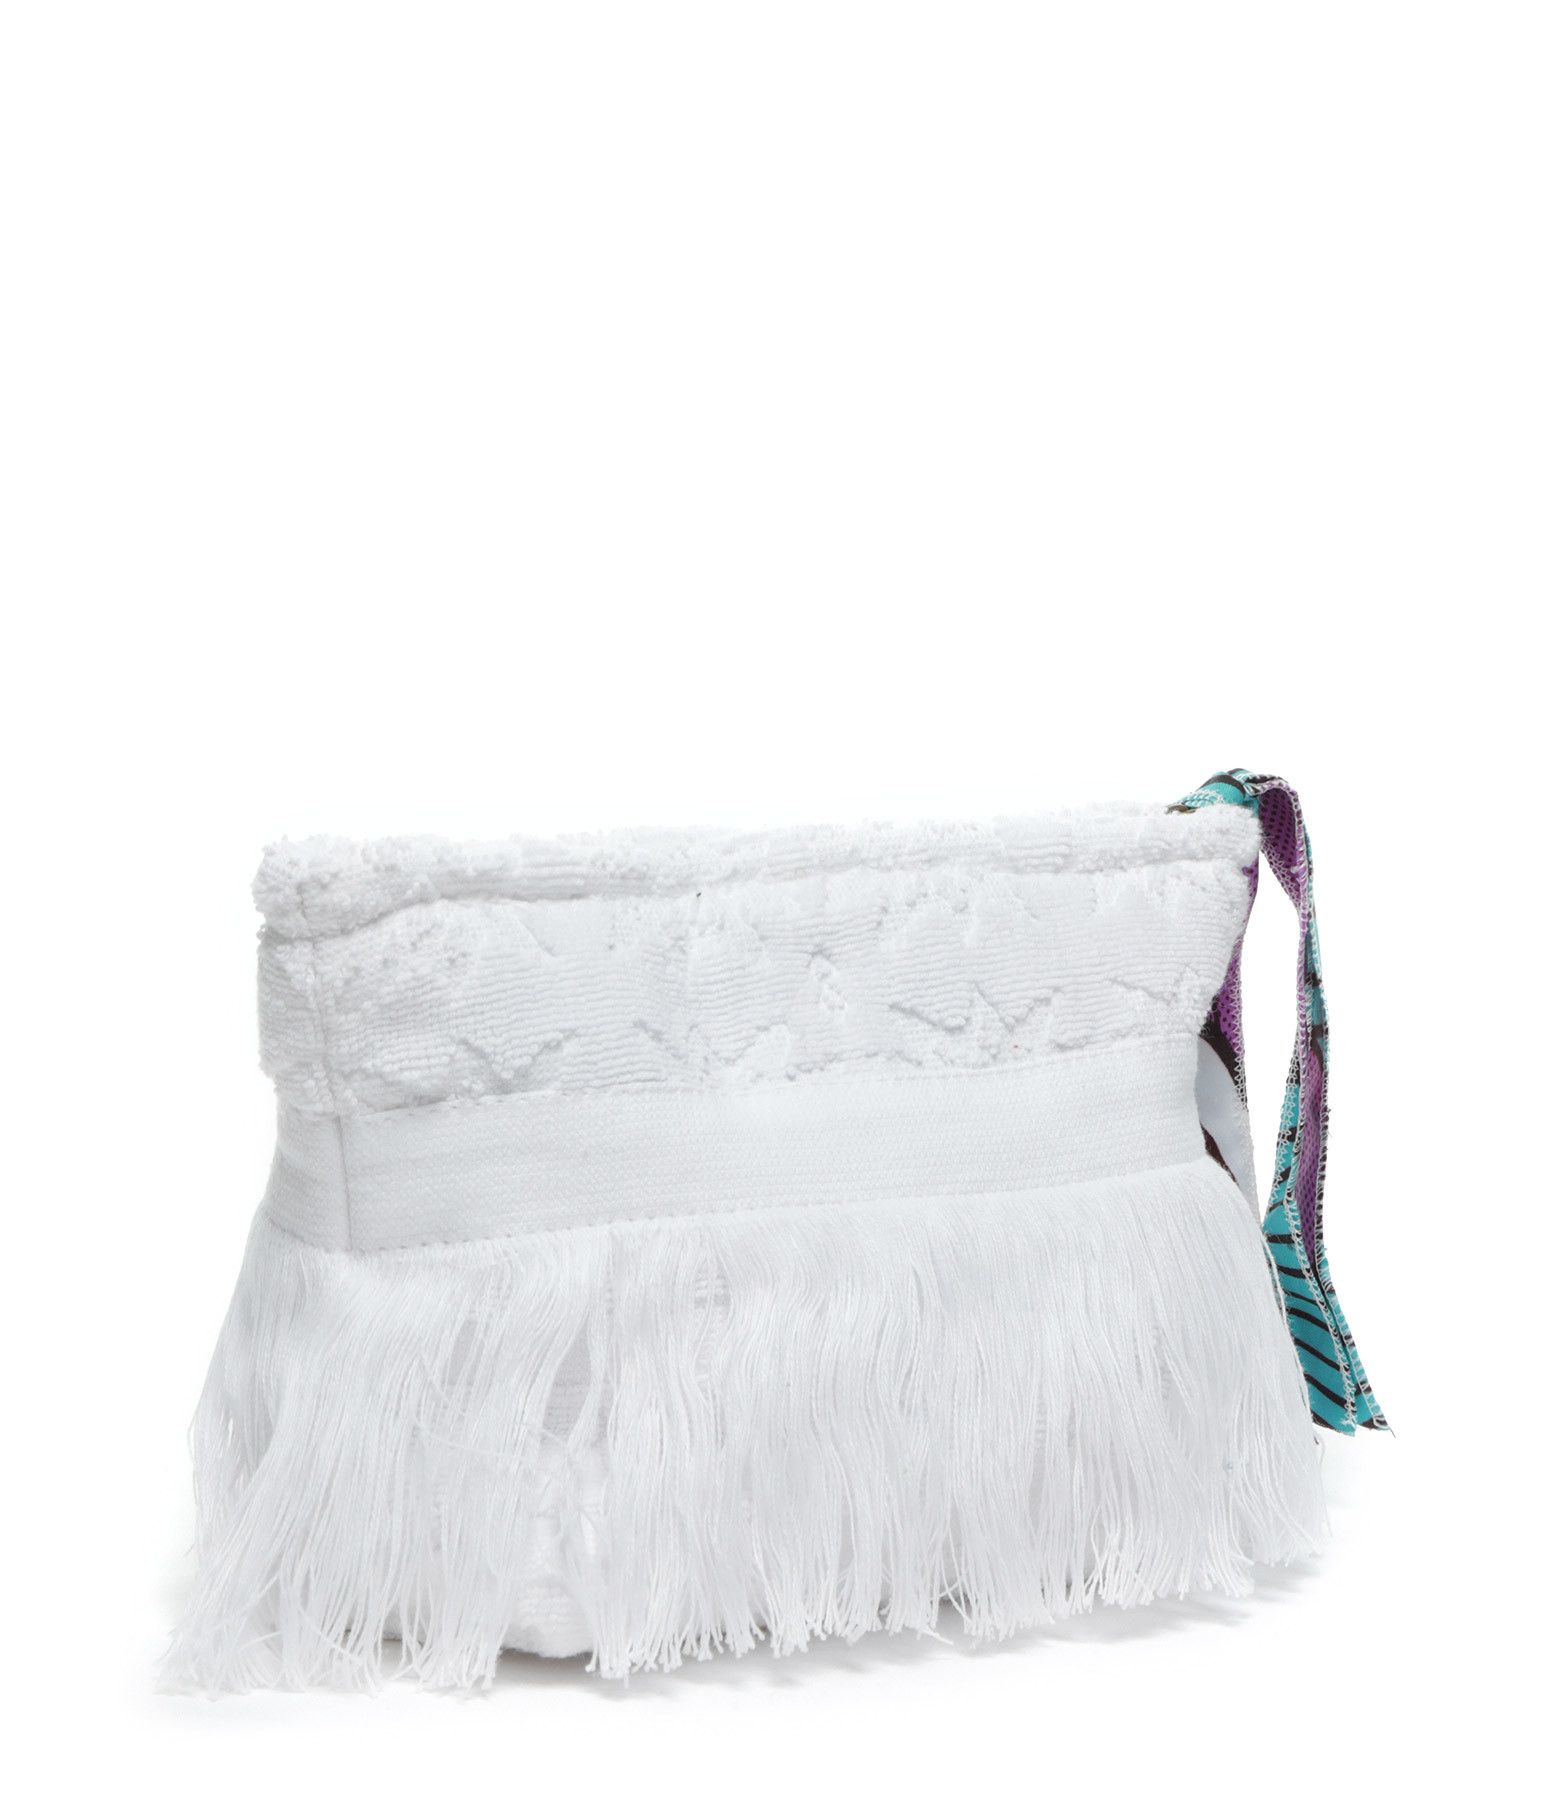 LALLA - Petite Trousse Walakin Hippie Éponge Blanc